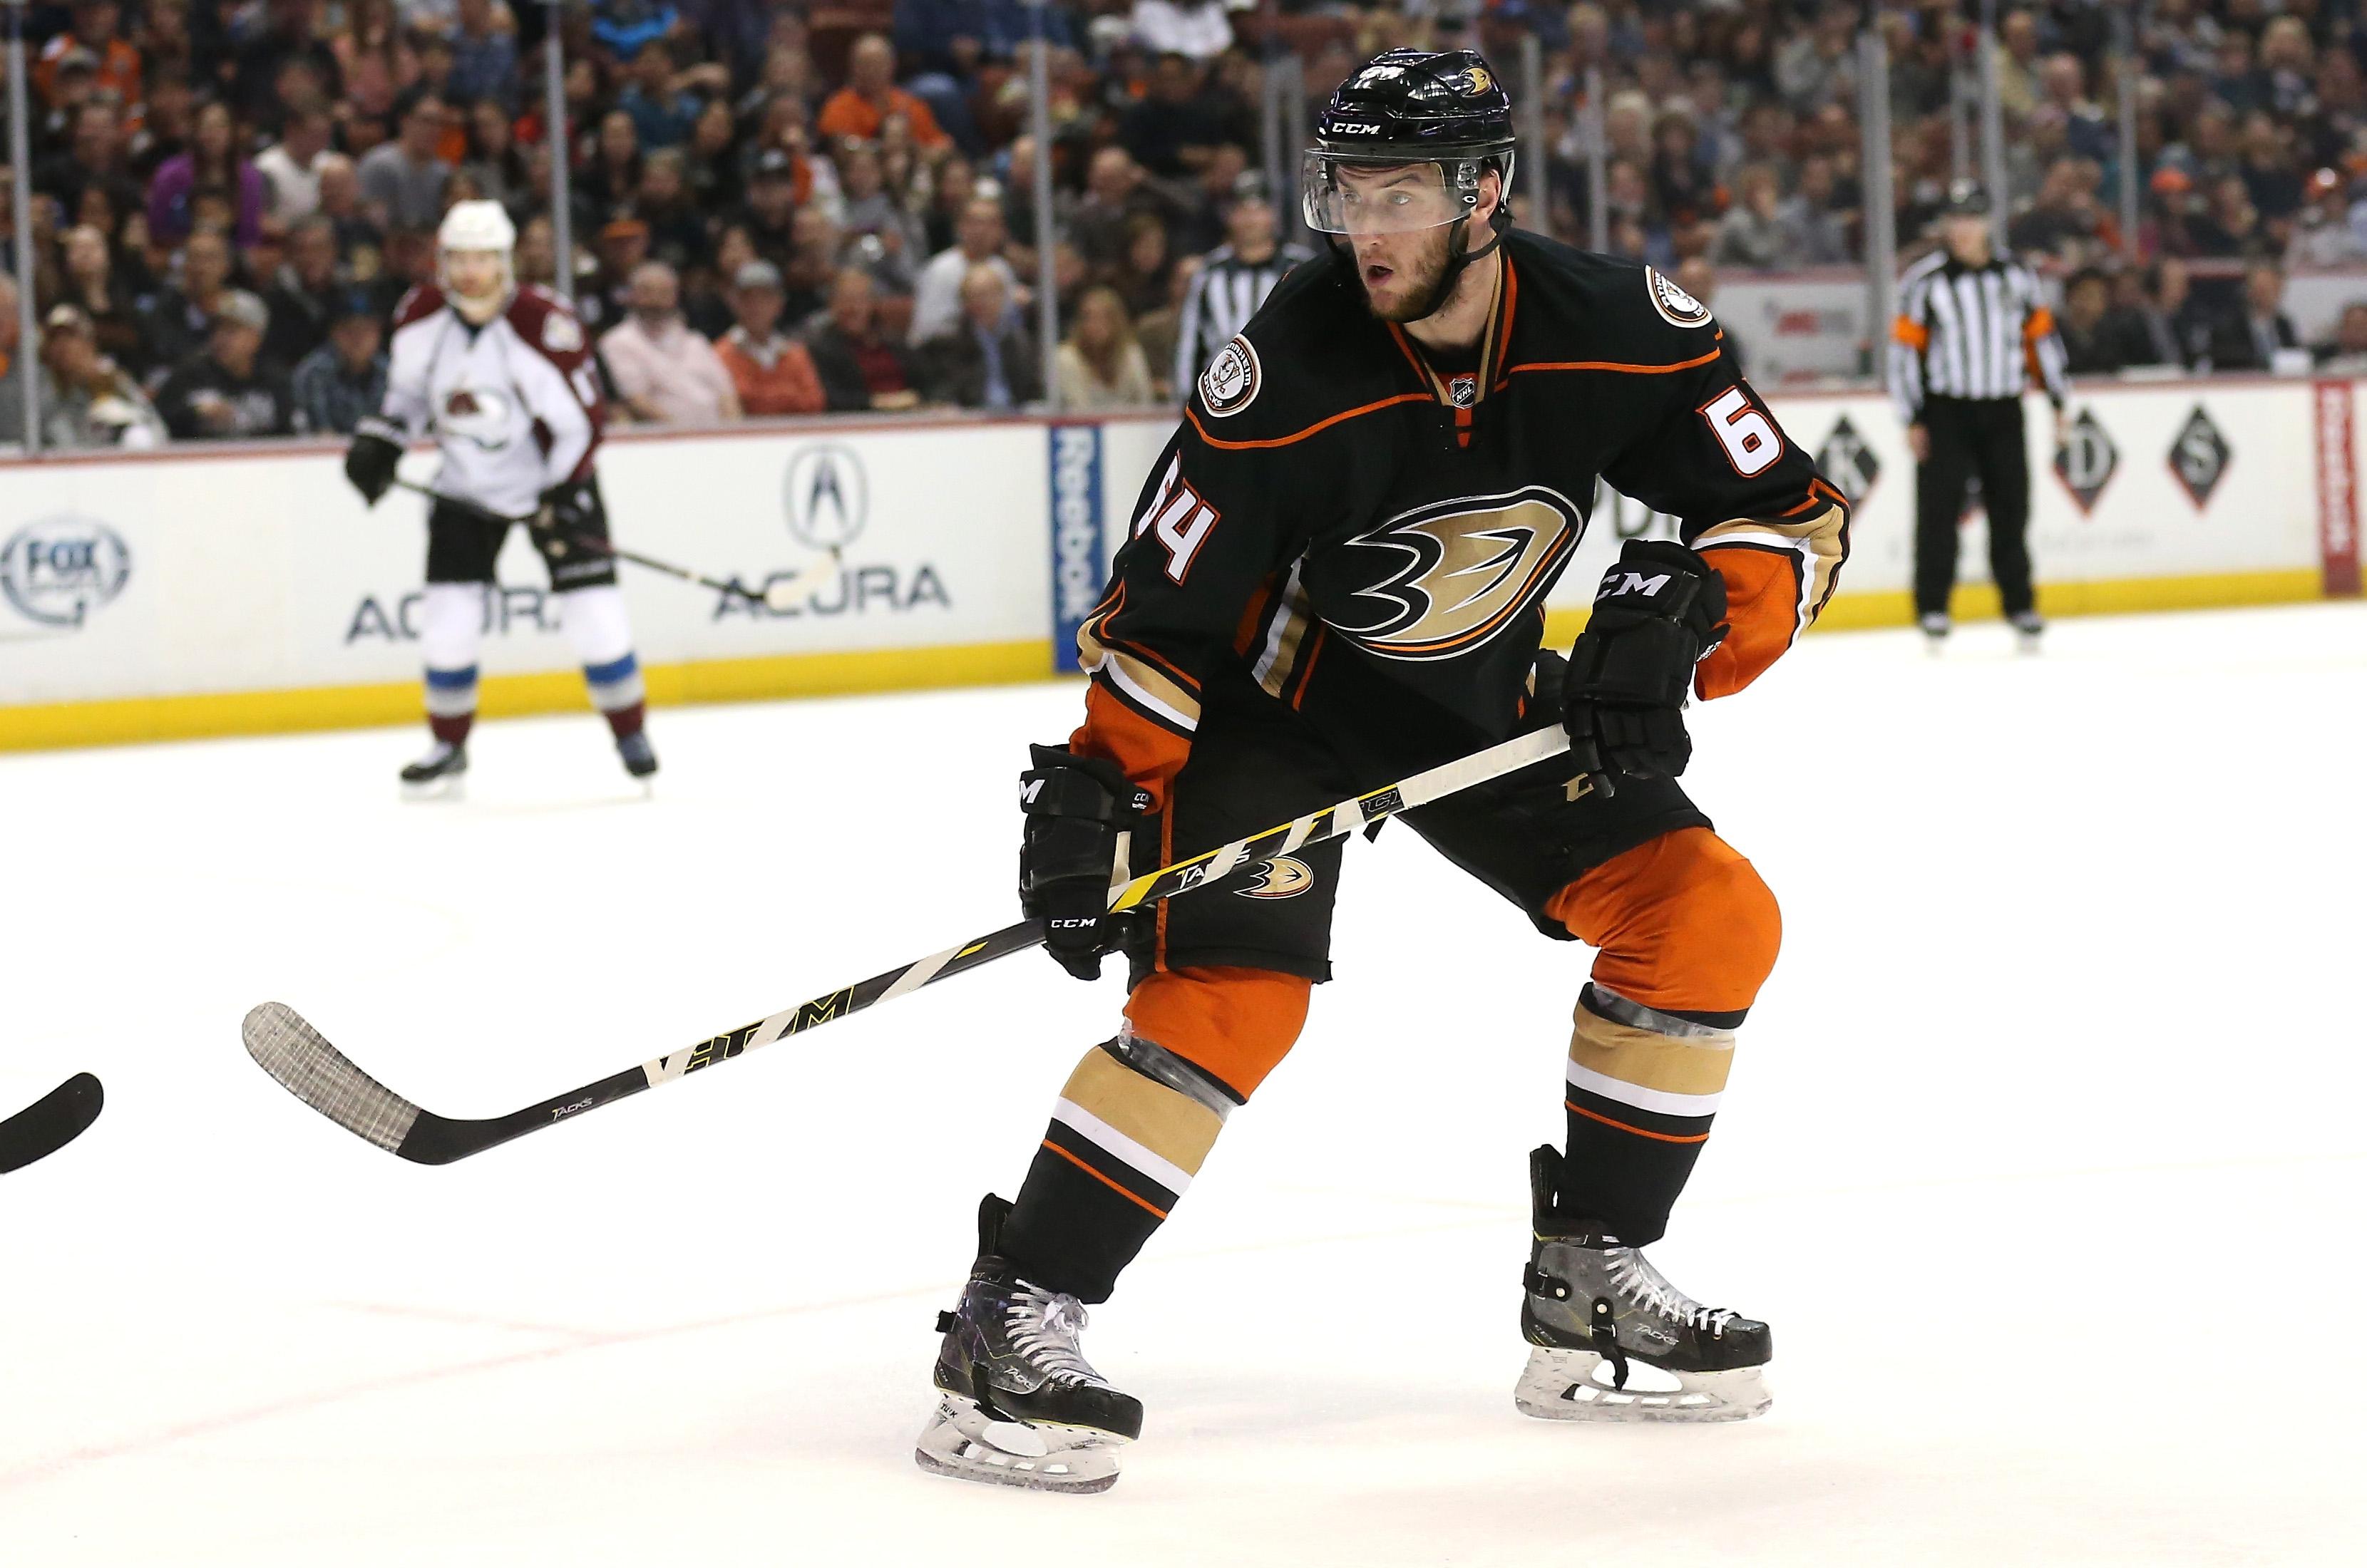 Stefan Noesen Makes His NHL Debut on April 3, 2015